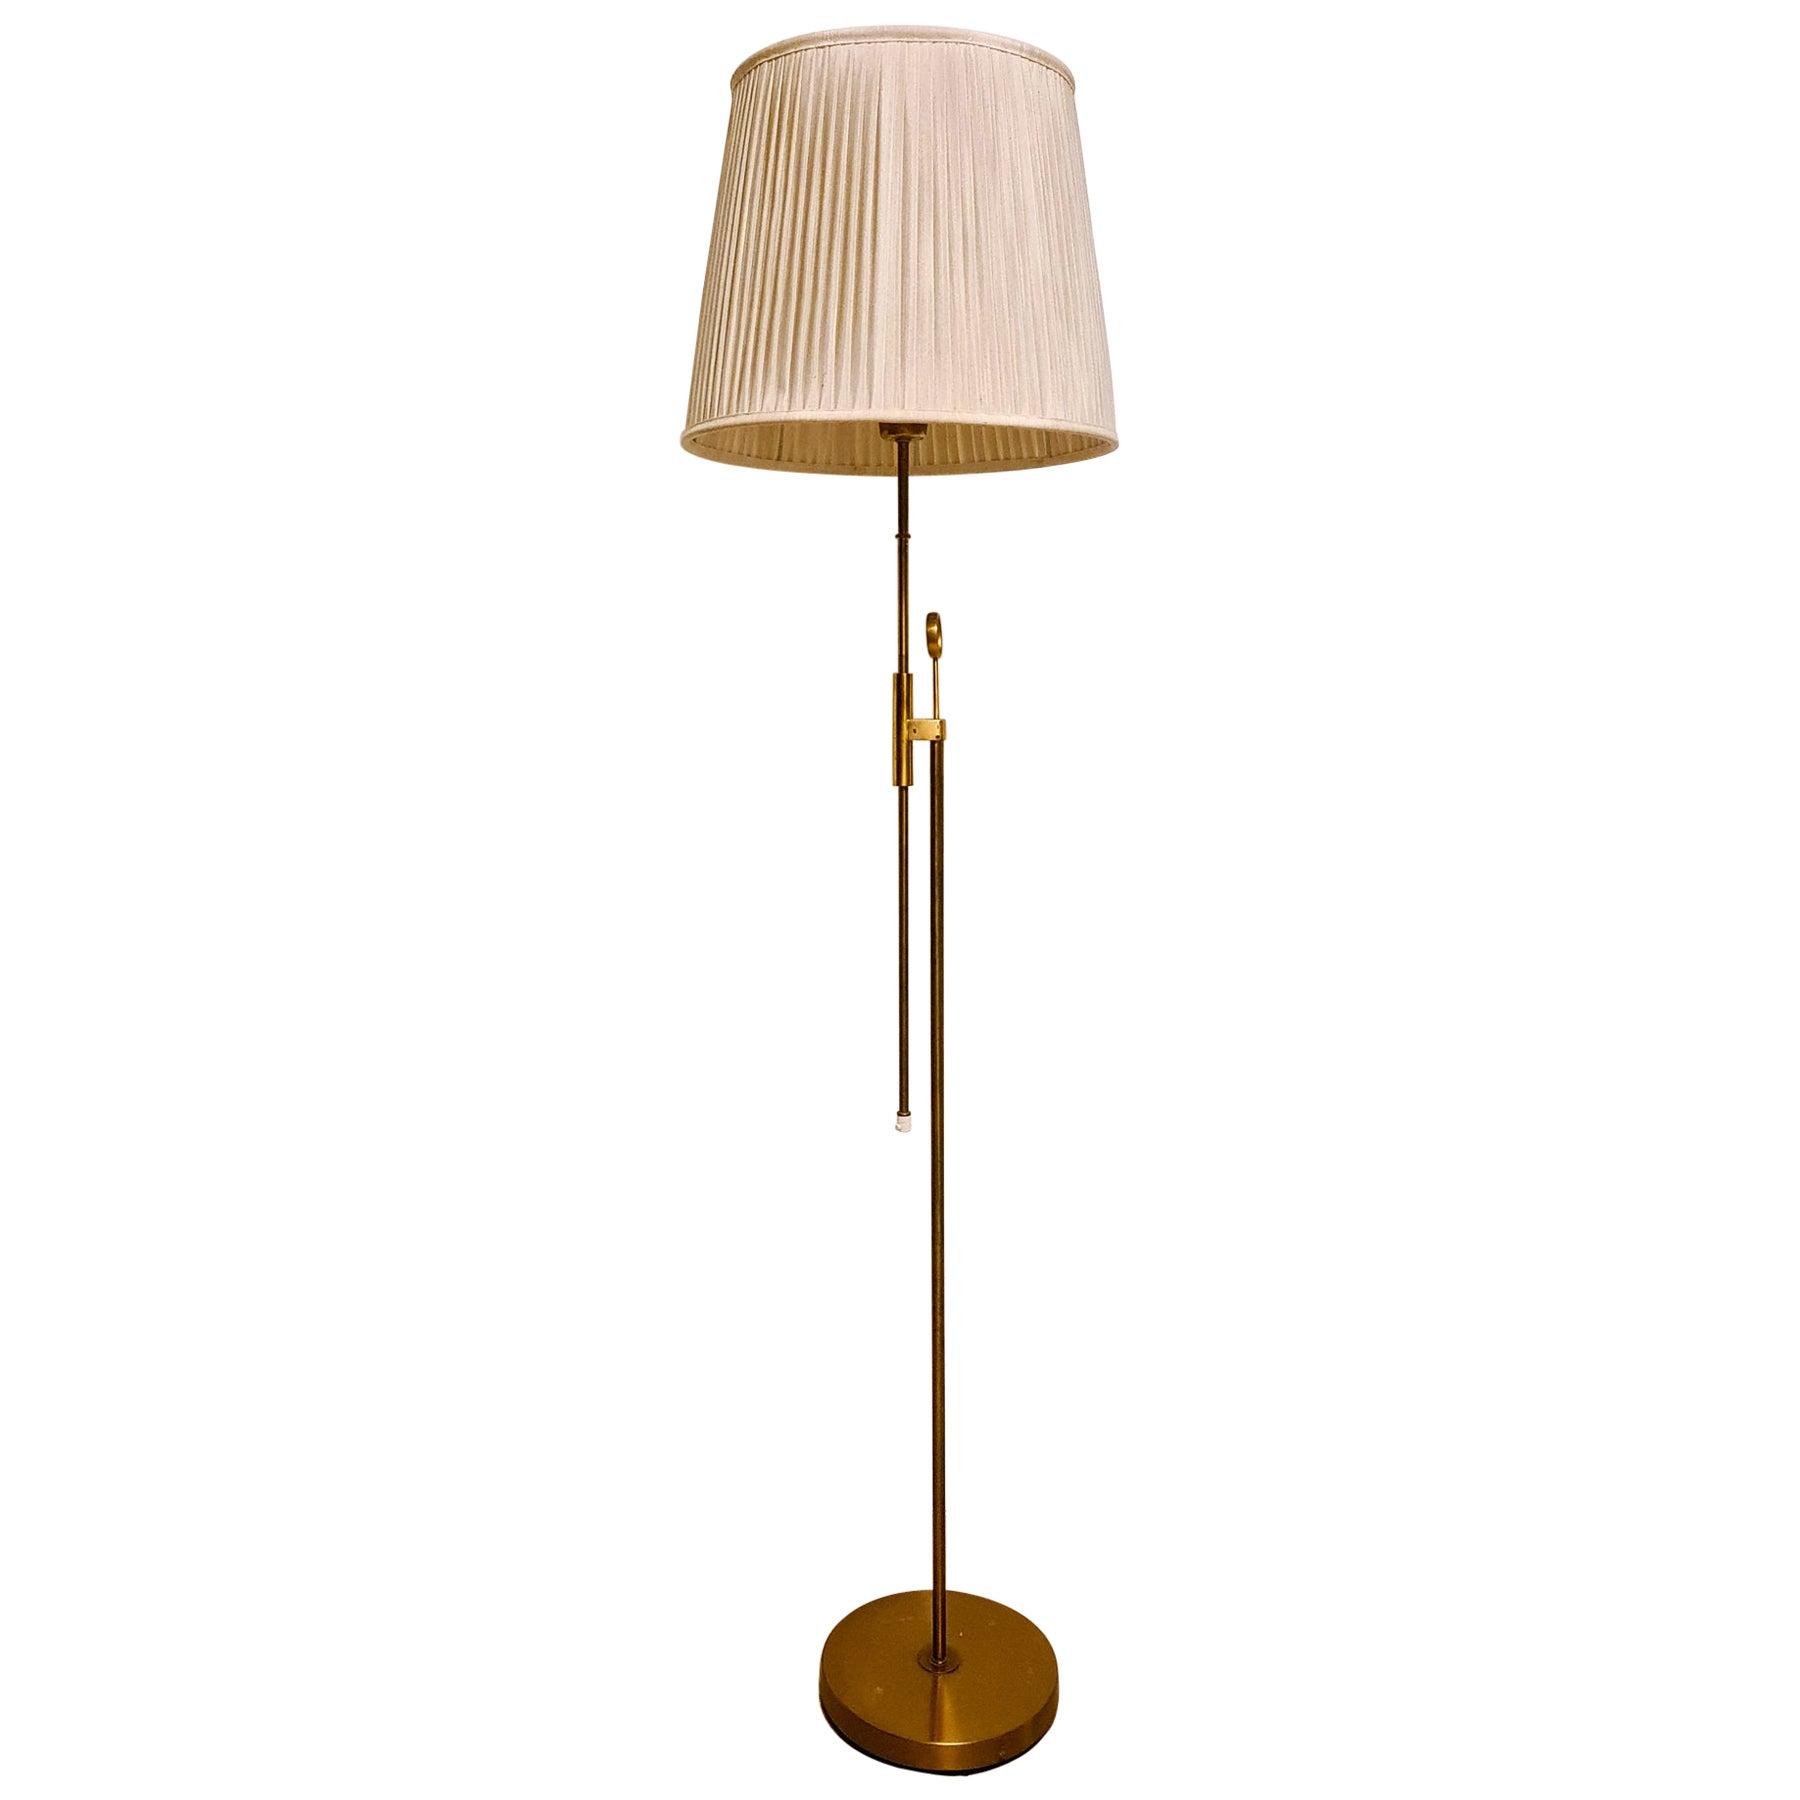 Midcentury Brass Floor Lamp Falkenbergs Belysning, Sweden, 1960s